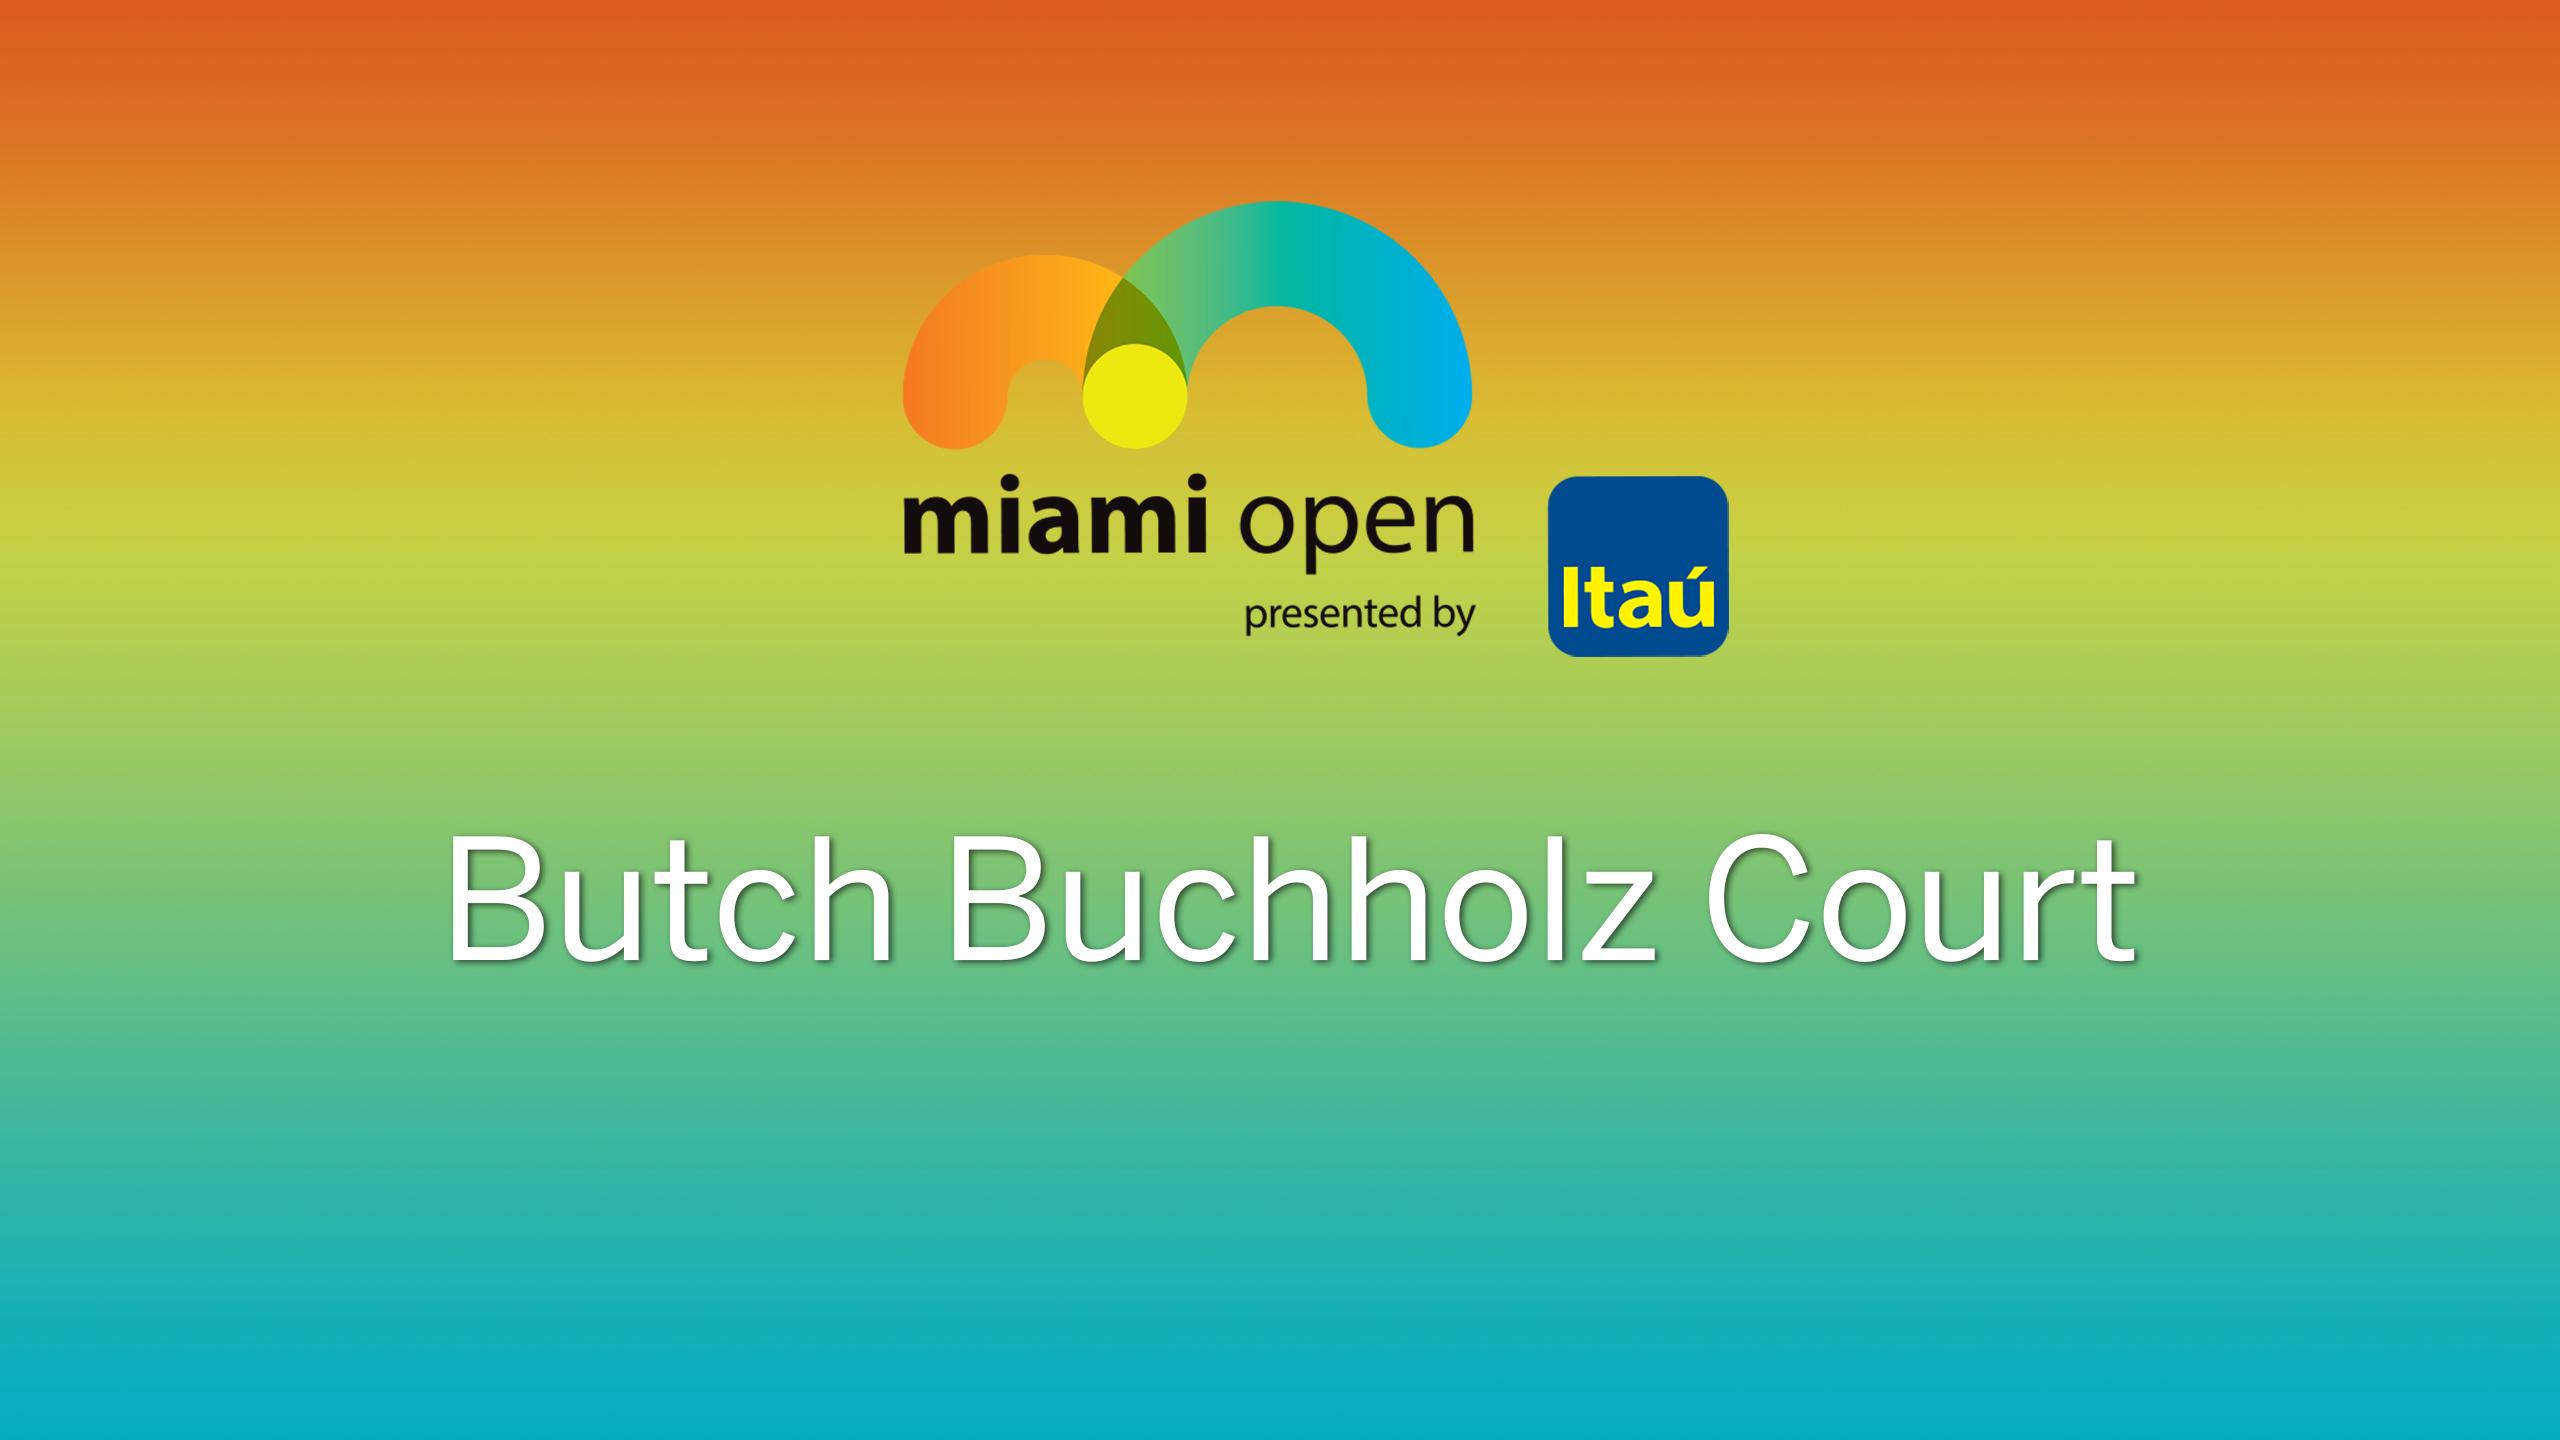 ATP: Butch Buchholz Court - Miami Open